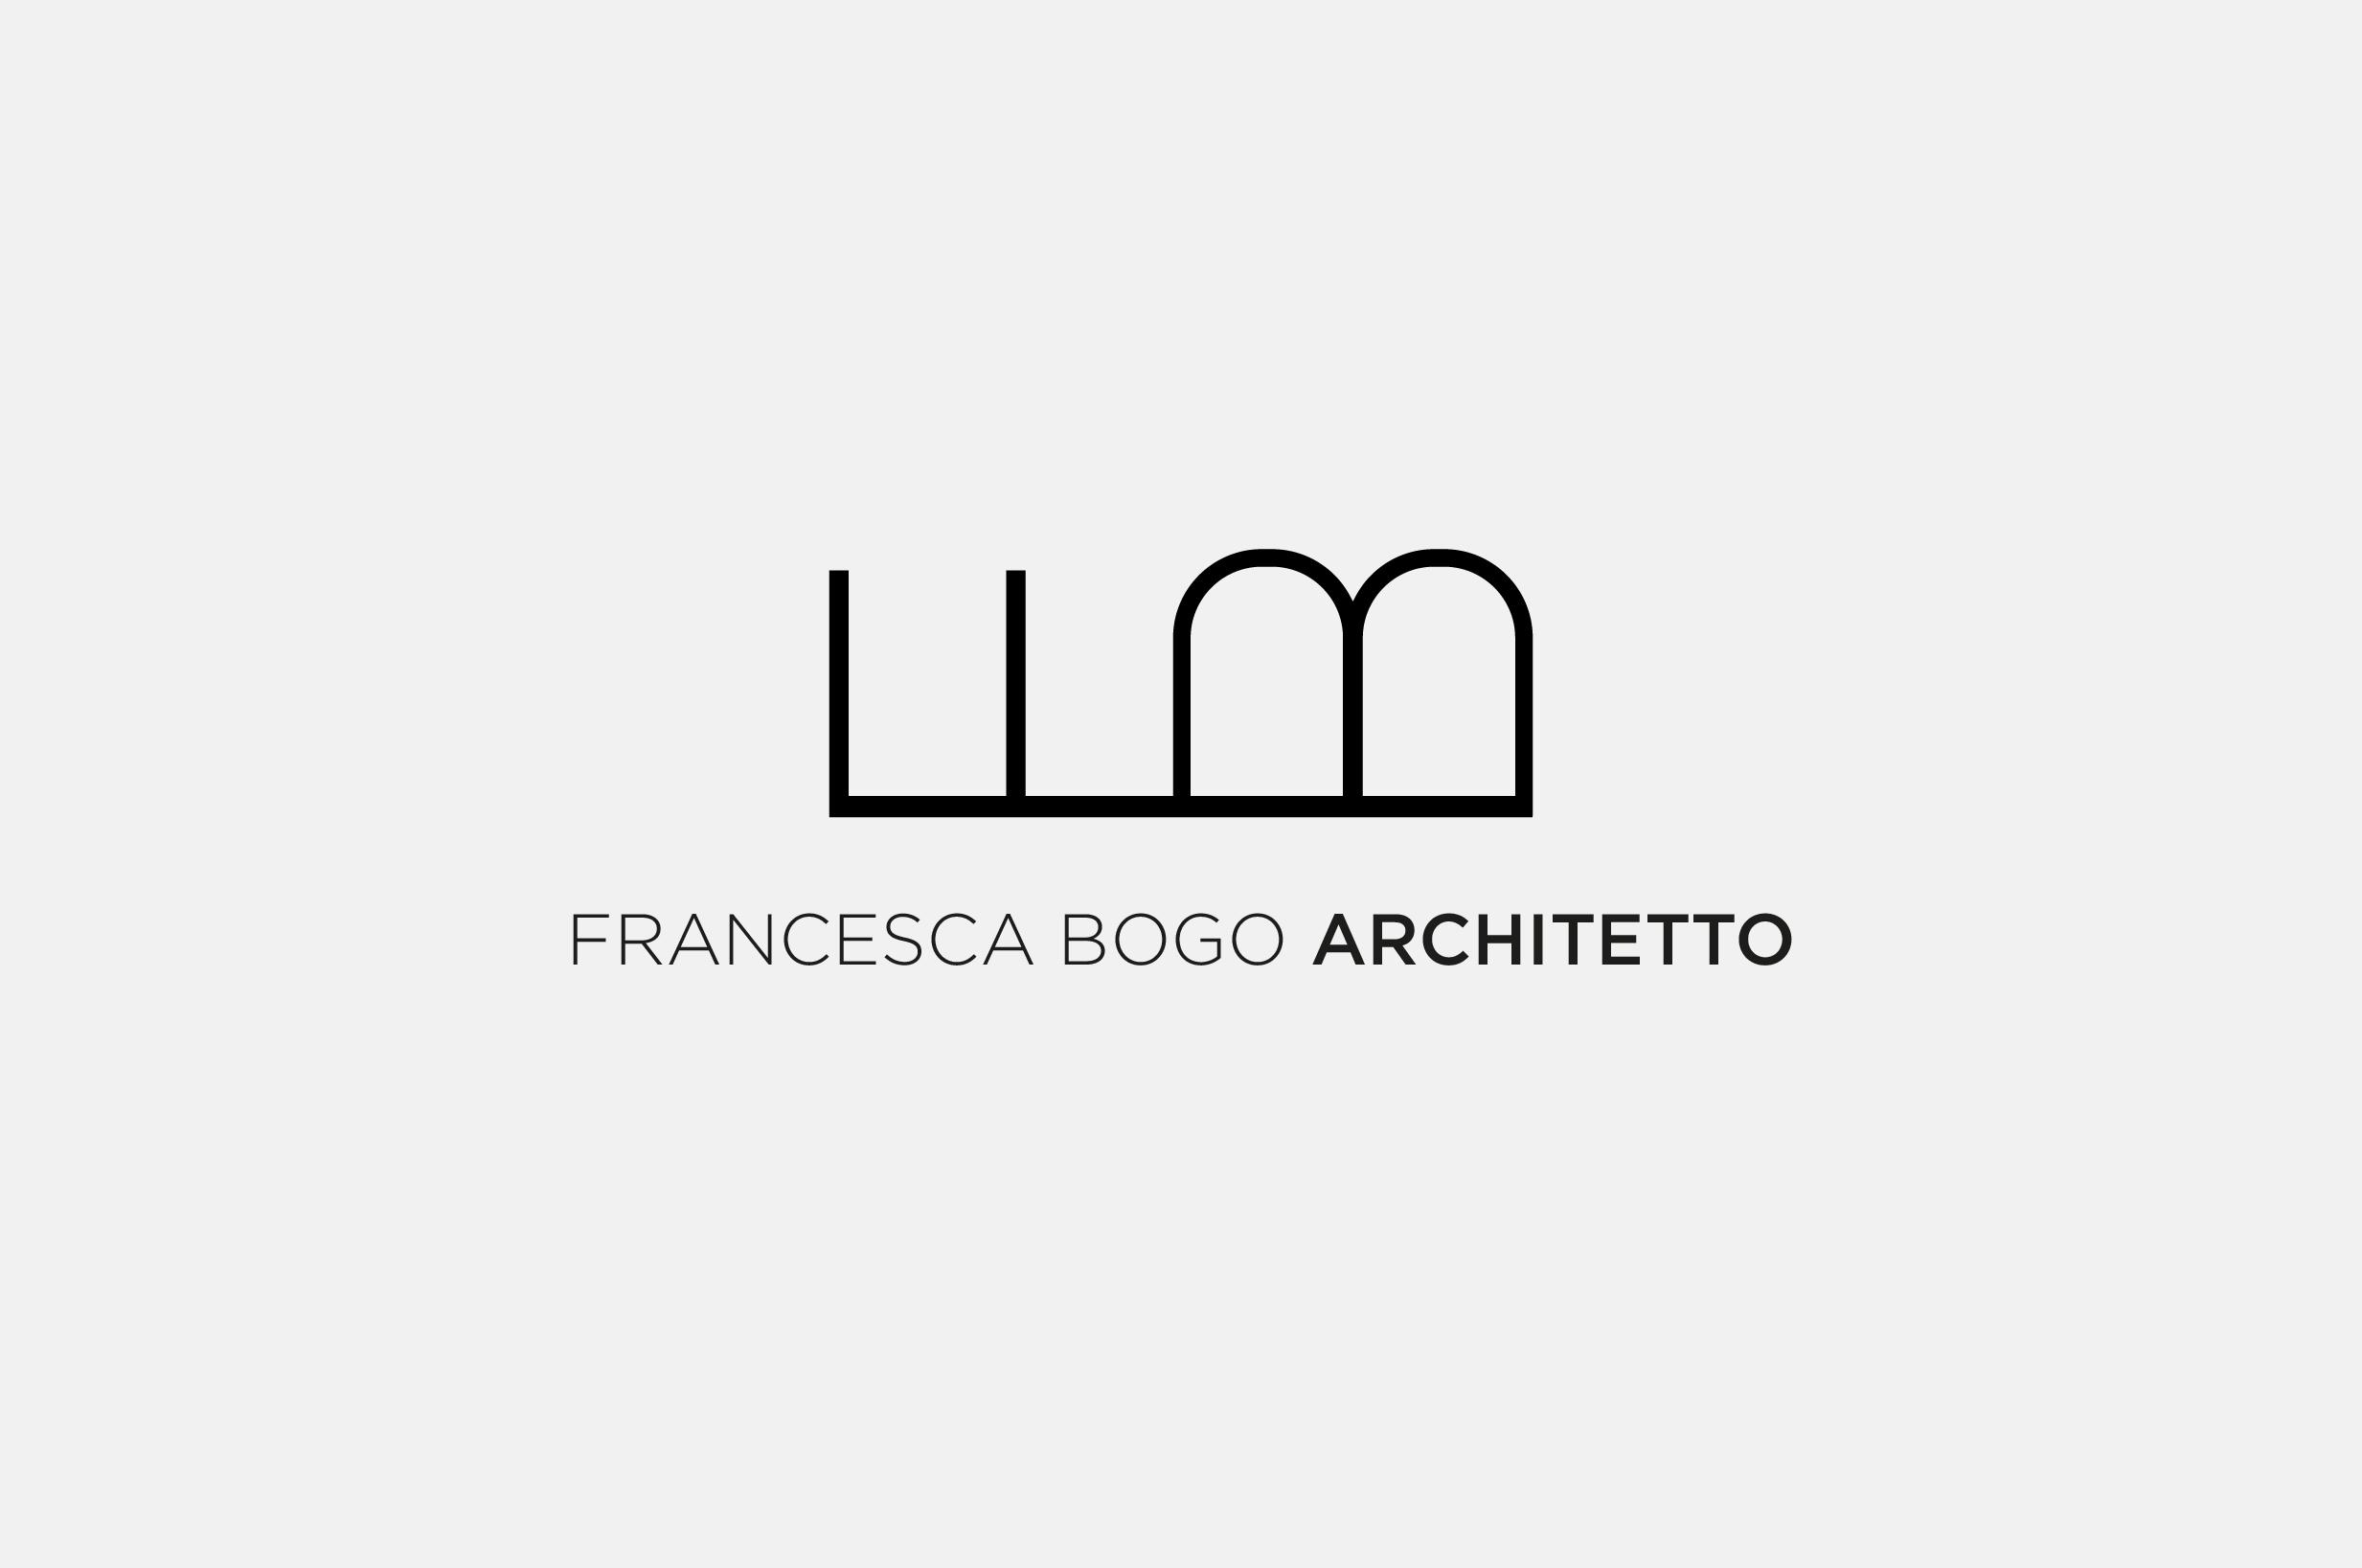 Francesca Bogo Architetto